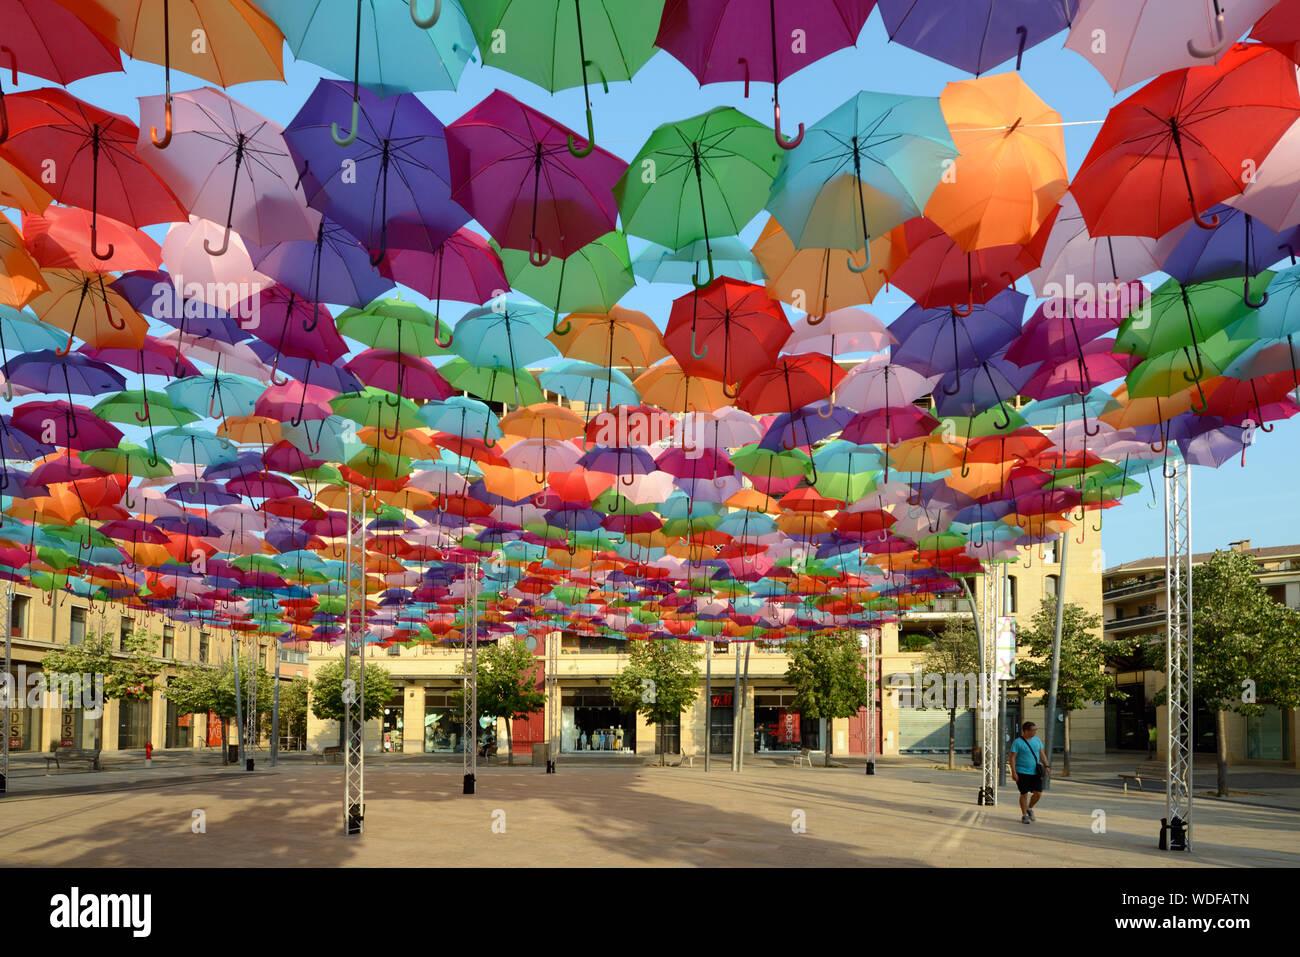 Colourful Parasols or Umbrellas Hanging Above Place Francois Villon, by Artist Patricia Cunha Umbrella Sky Project Art Installation Aix-en-Provence Stock Photo